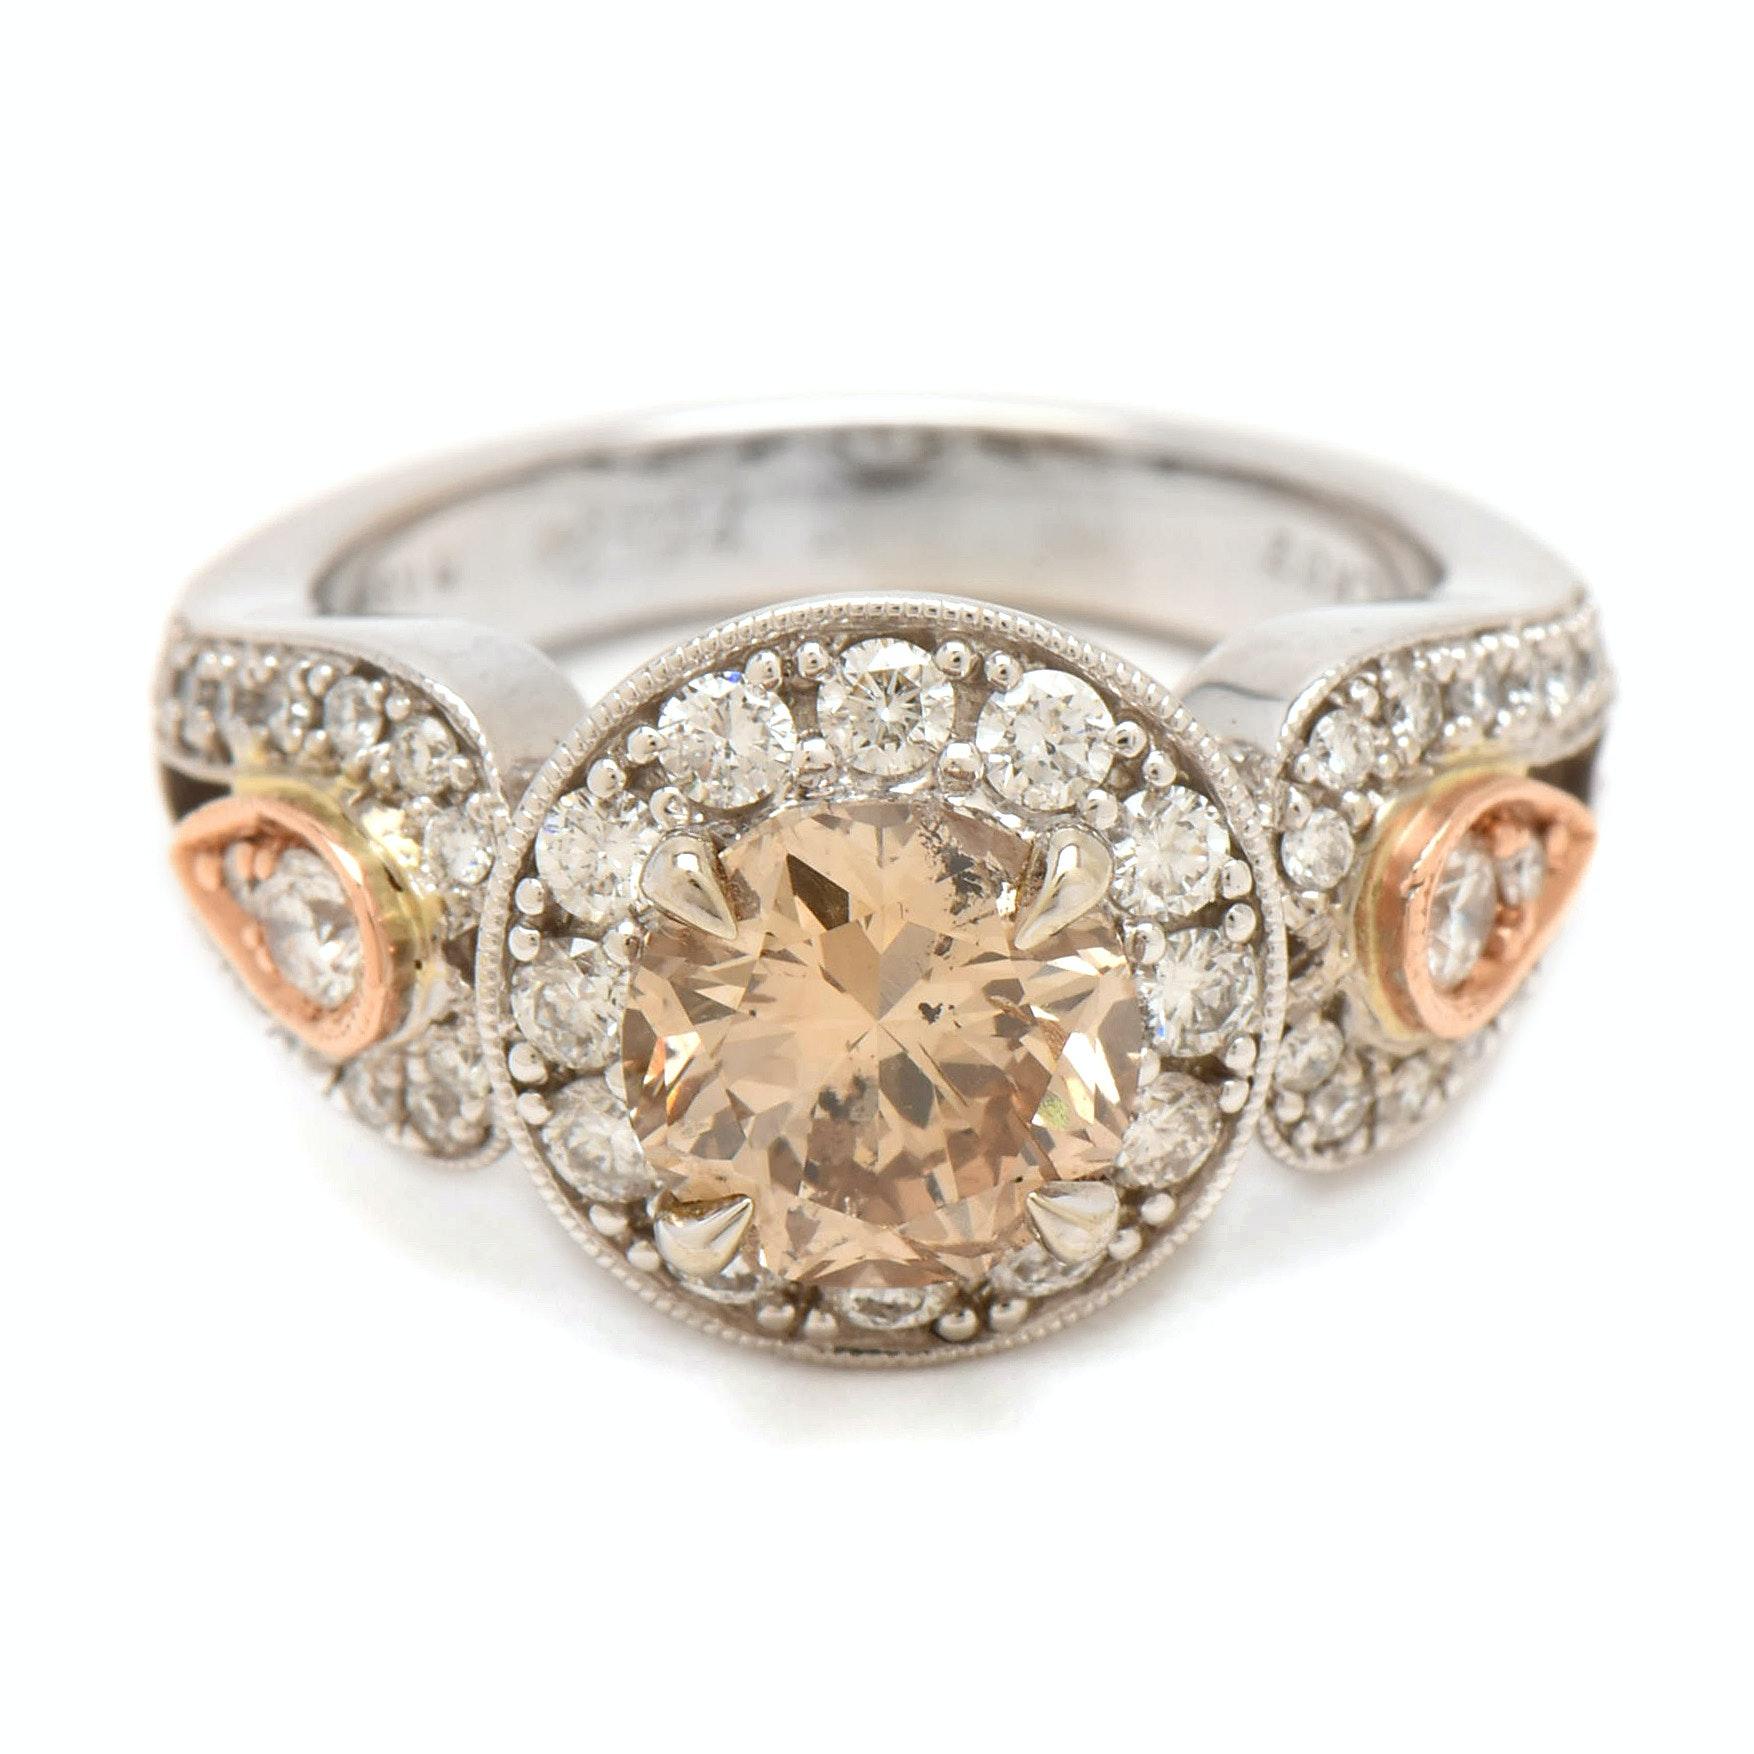 14K White Gold 2.60 CTW Diamond Ring